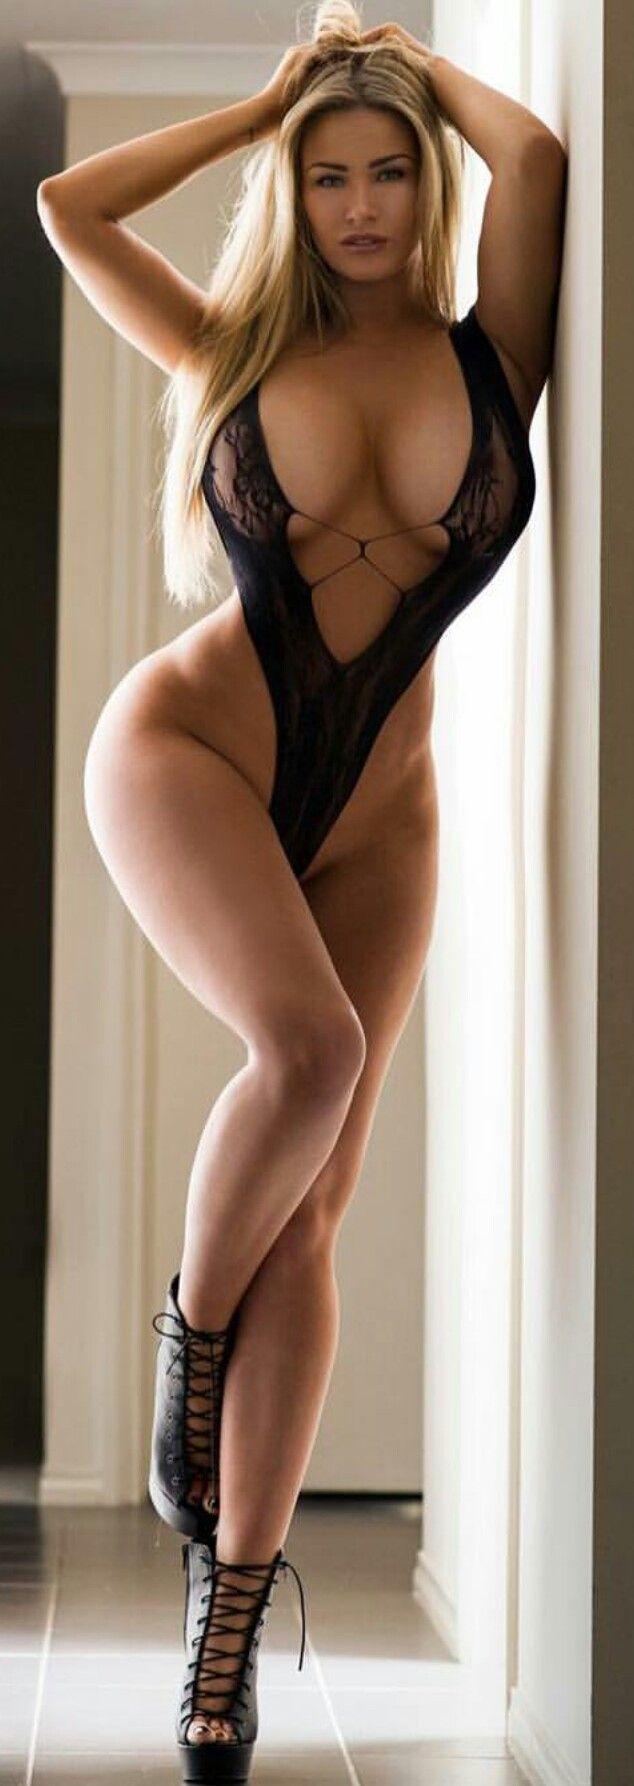 bikini-end-nud-girl-foto-jessica-sinpsons-xxx